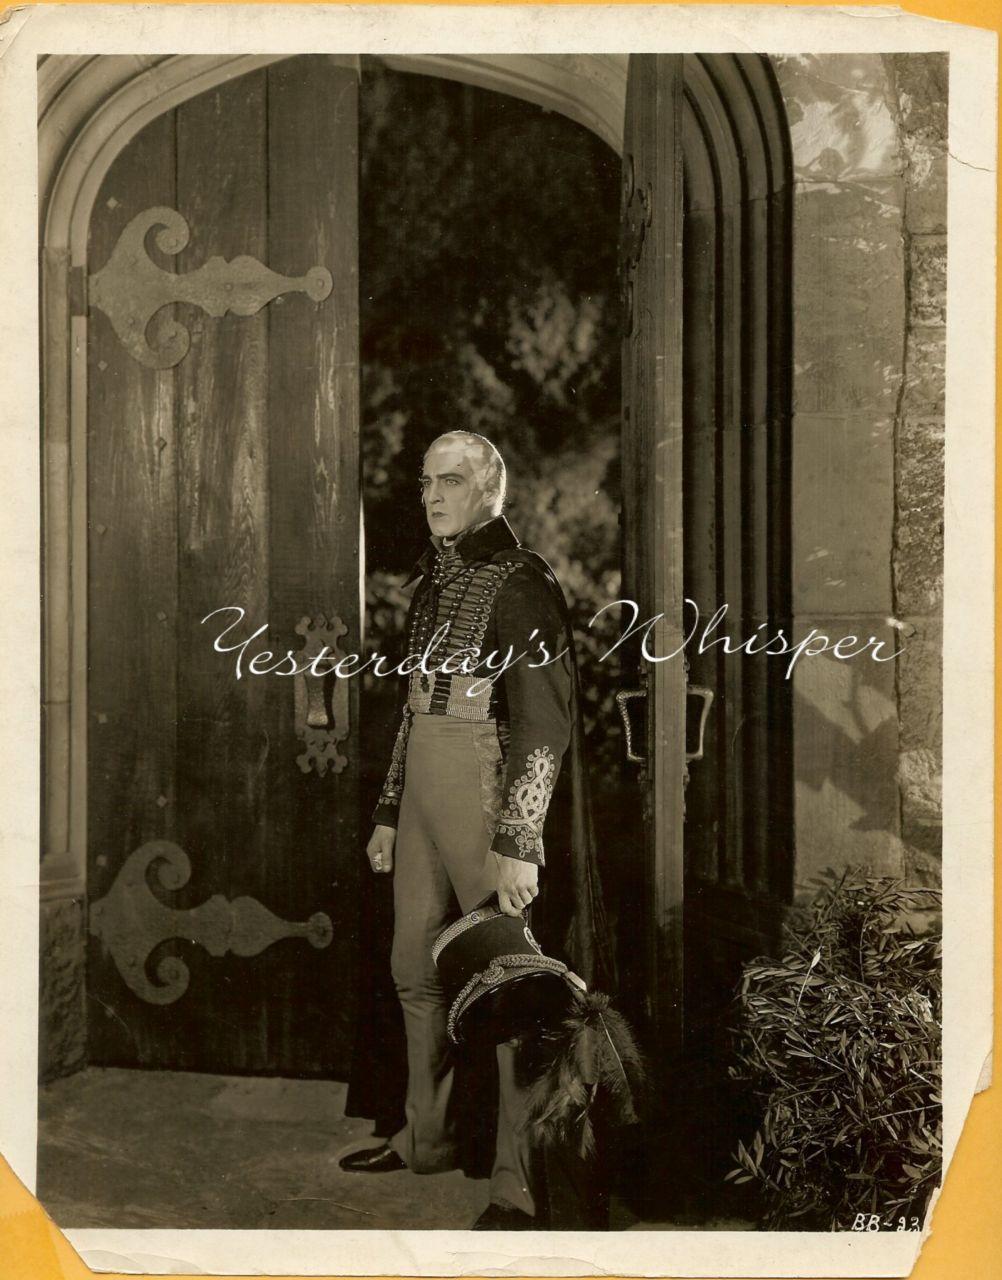 John Barrymore Beau Brummel Original 1924 Movie Photo